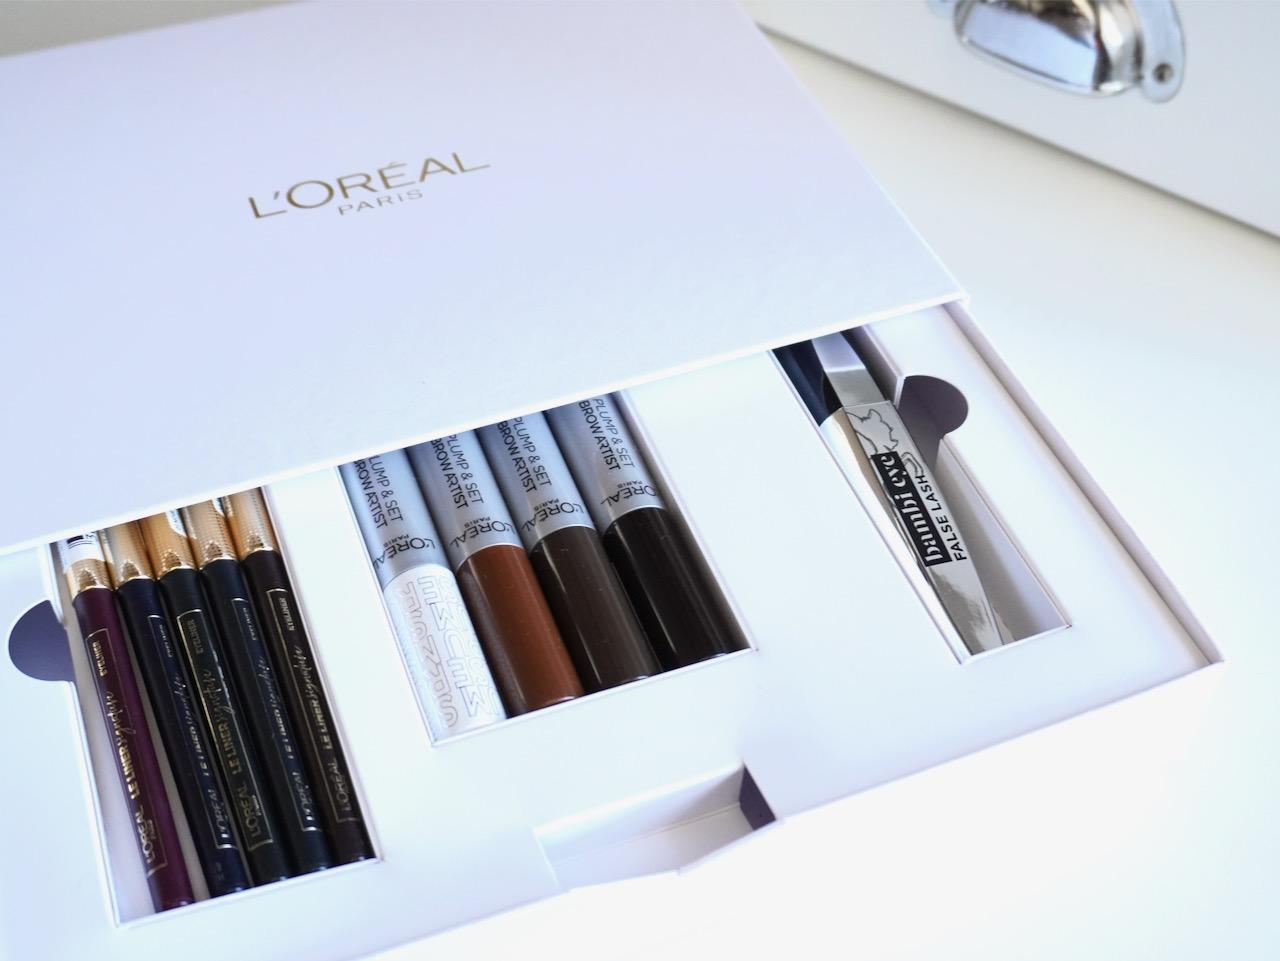 Make up, Loreal, L'Oreal Paris, Schminktipps, Make up Look, Augenbrauengel, Augenbrauen, Eyeliner, Schminktante, Anja Frankenhäuser, Top-Beautyblog, führender deutscher Beauty- und Fashionblog